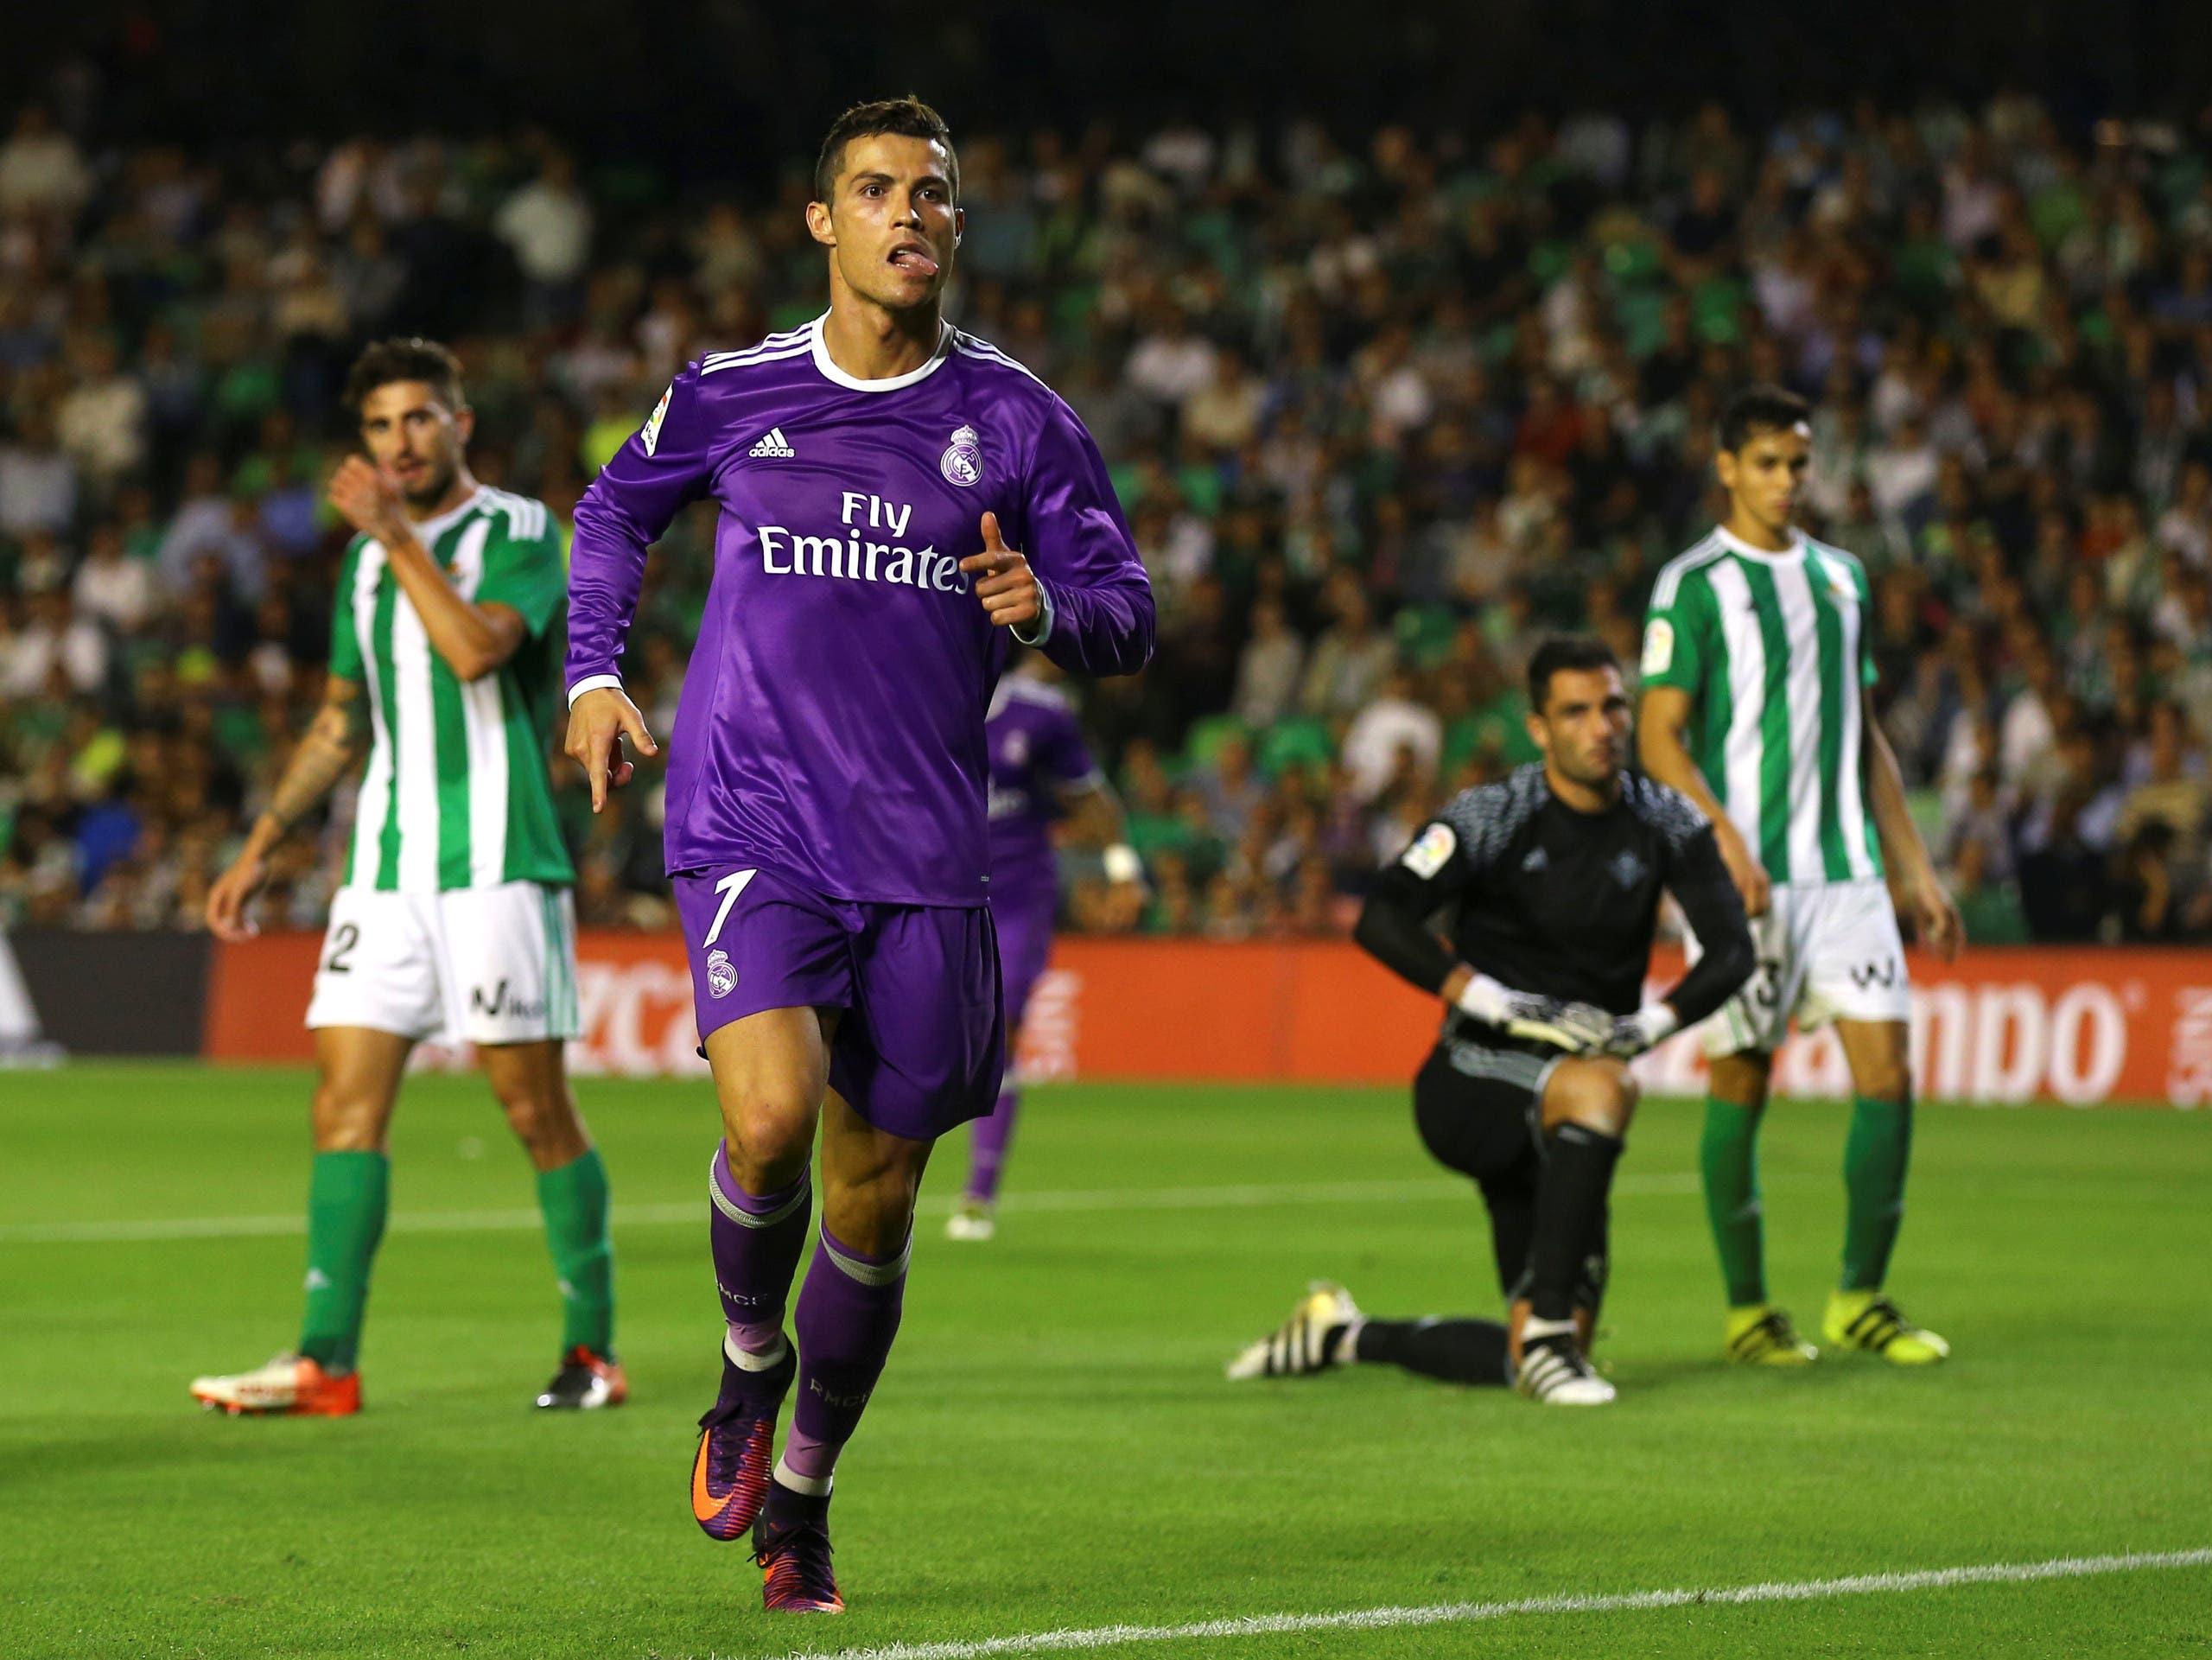 Cristiano Ronaldo celebrates his goal against Real Betis. (Reuters)